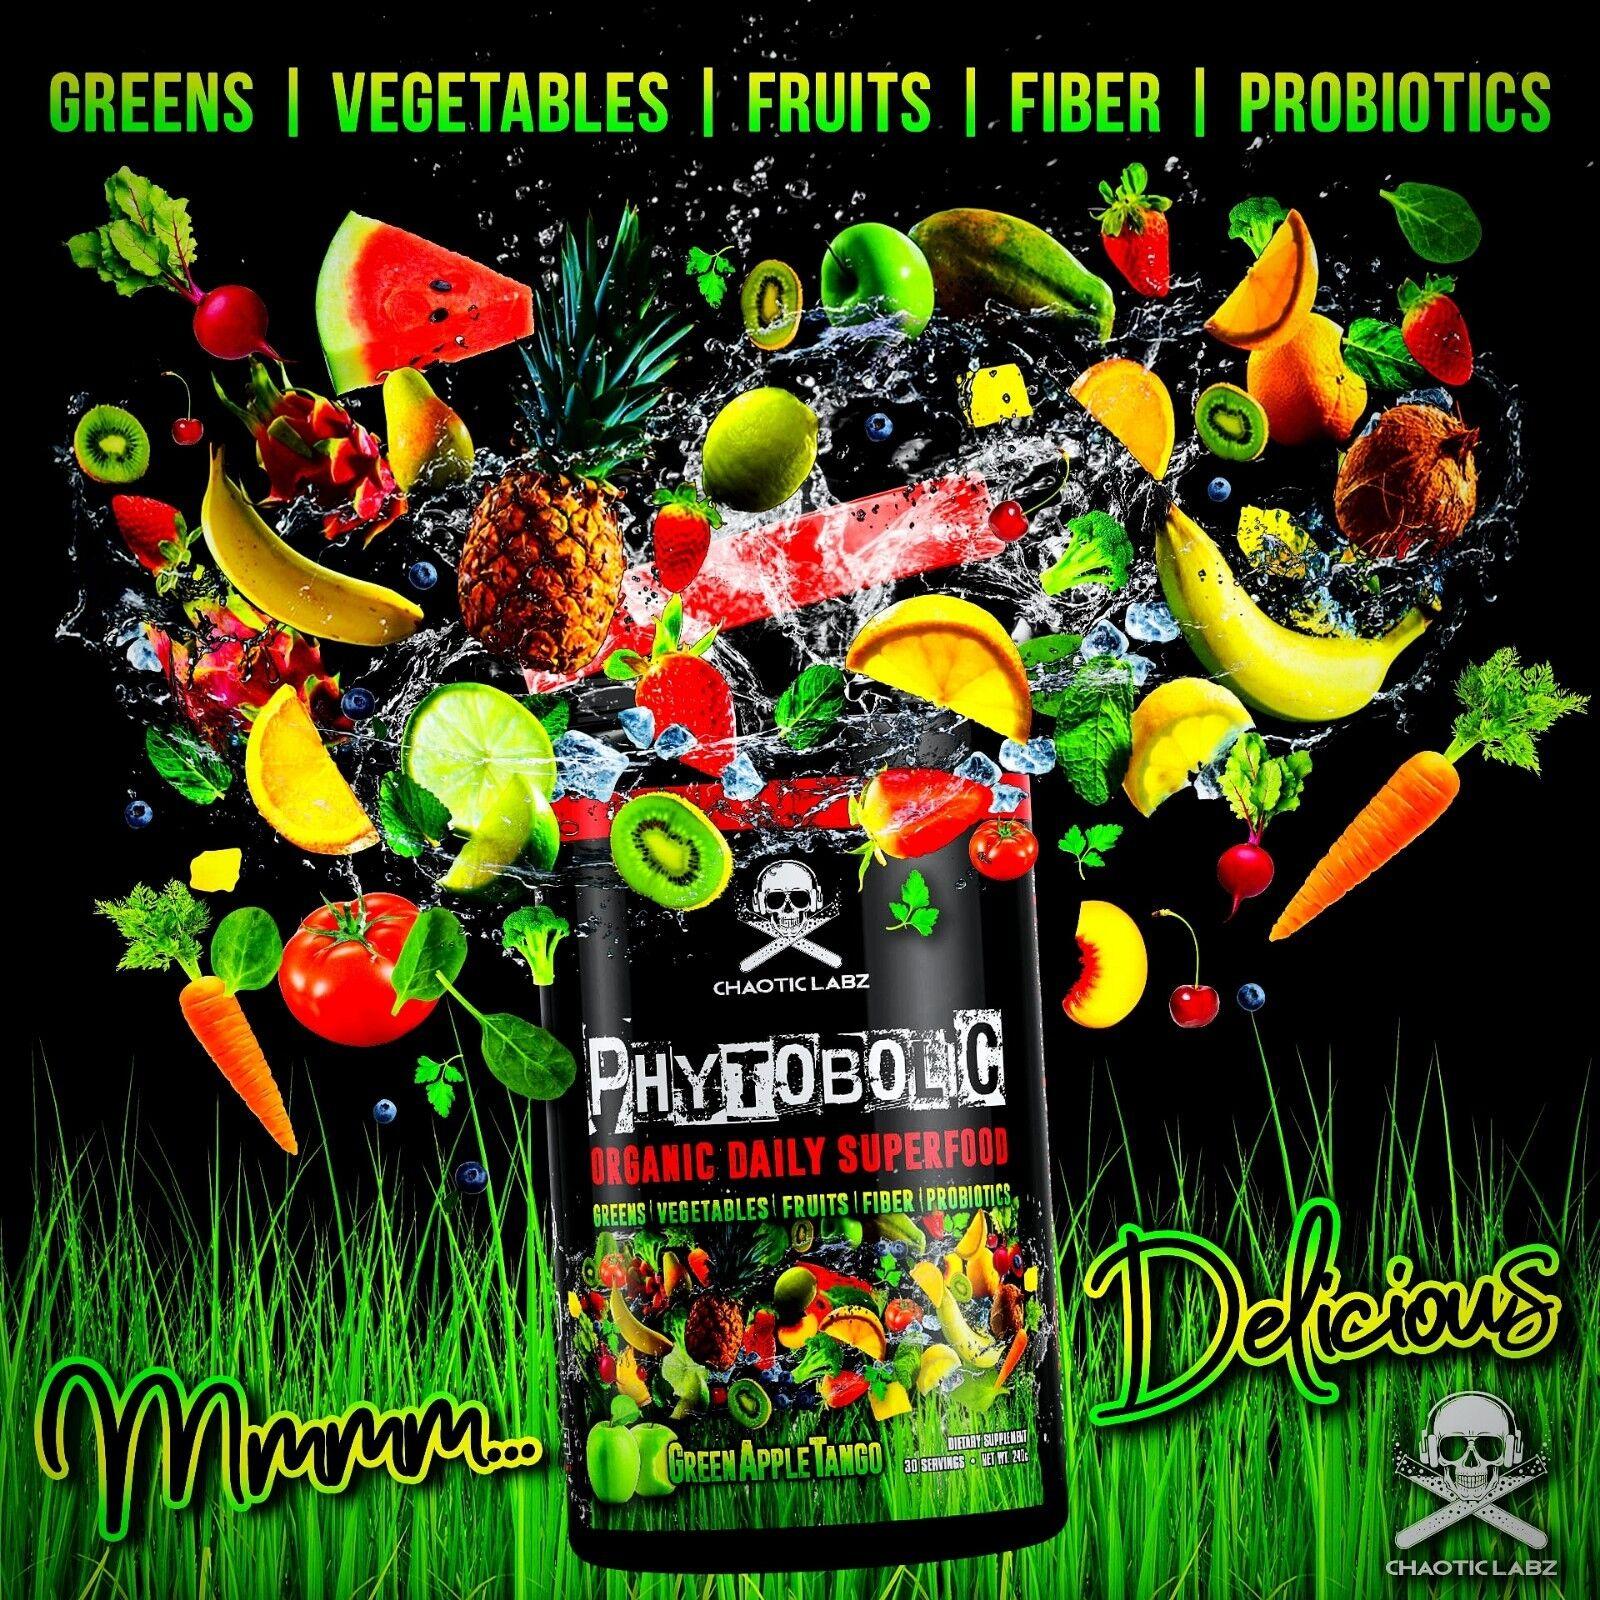 PHYTOBOLIC GREENS VEGGIES FRUITS FIBER PRE & PROBIOTICS  SUP